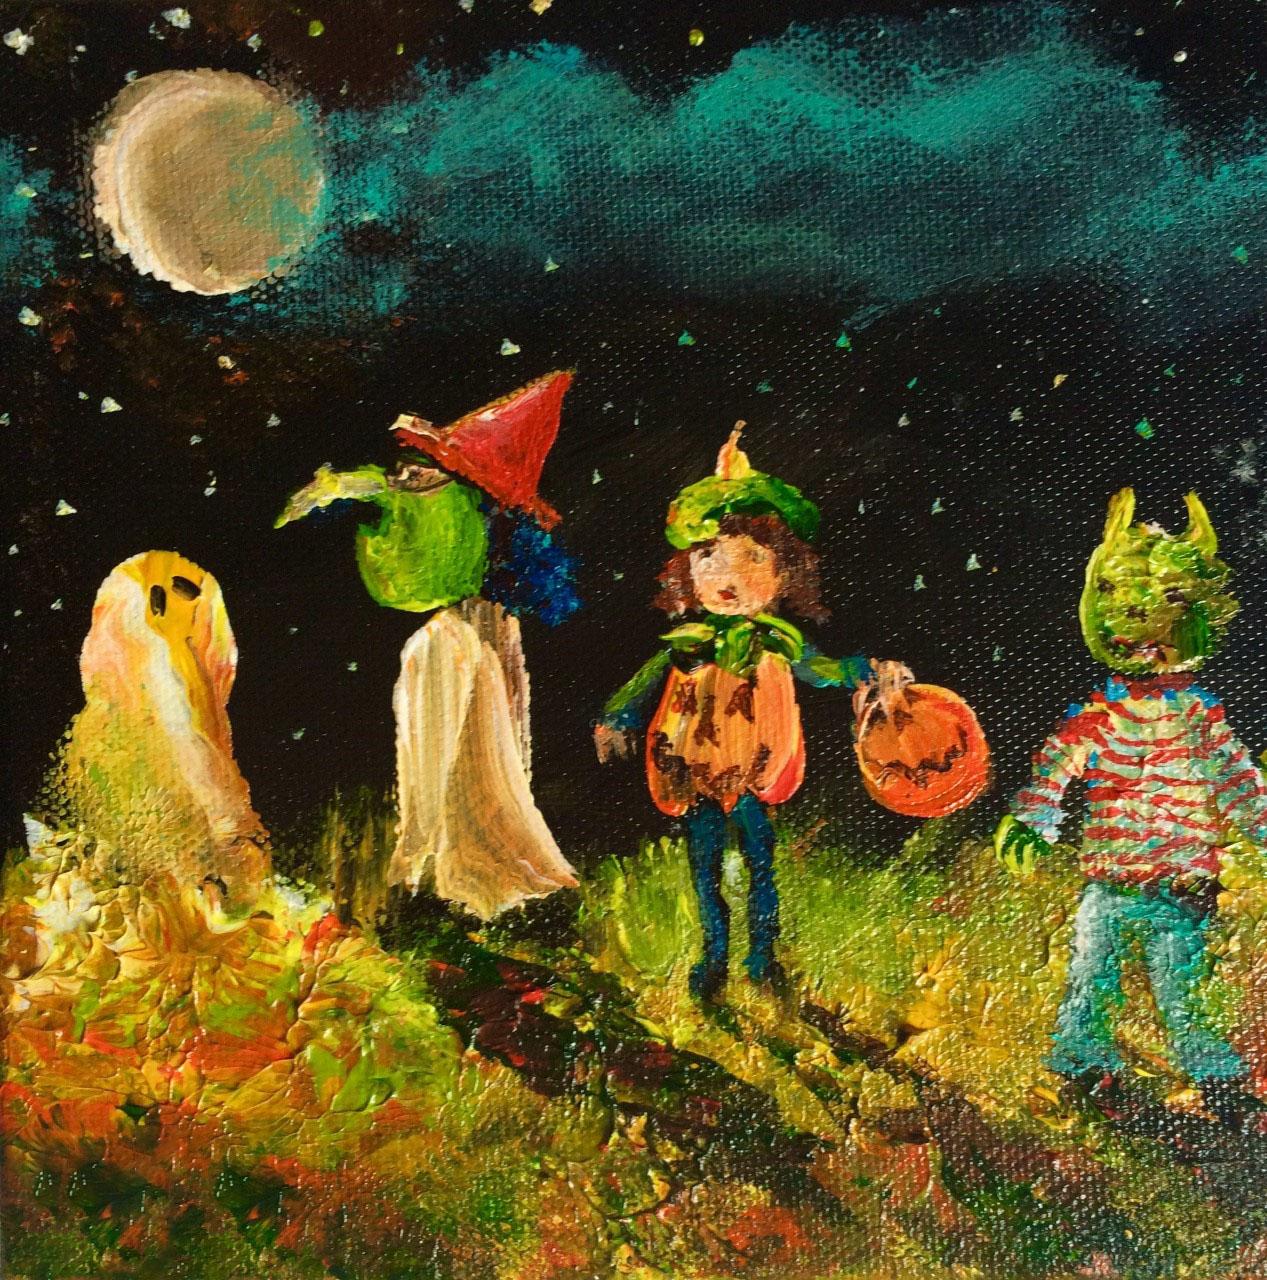 Tranh về halloween